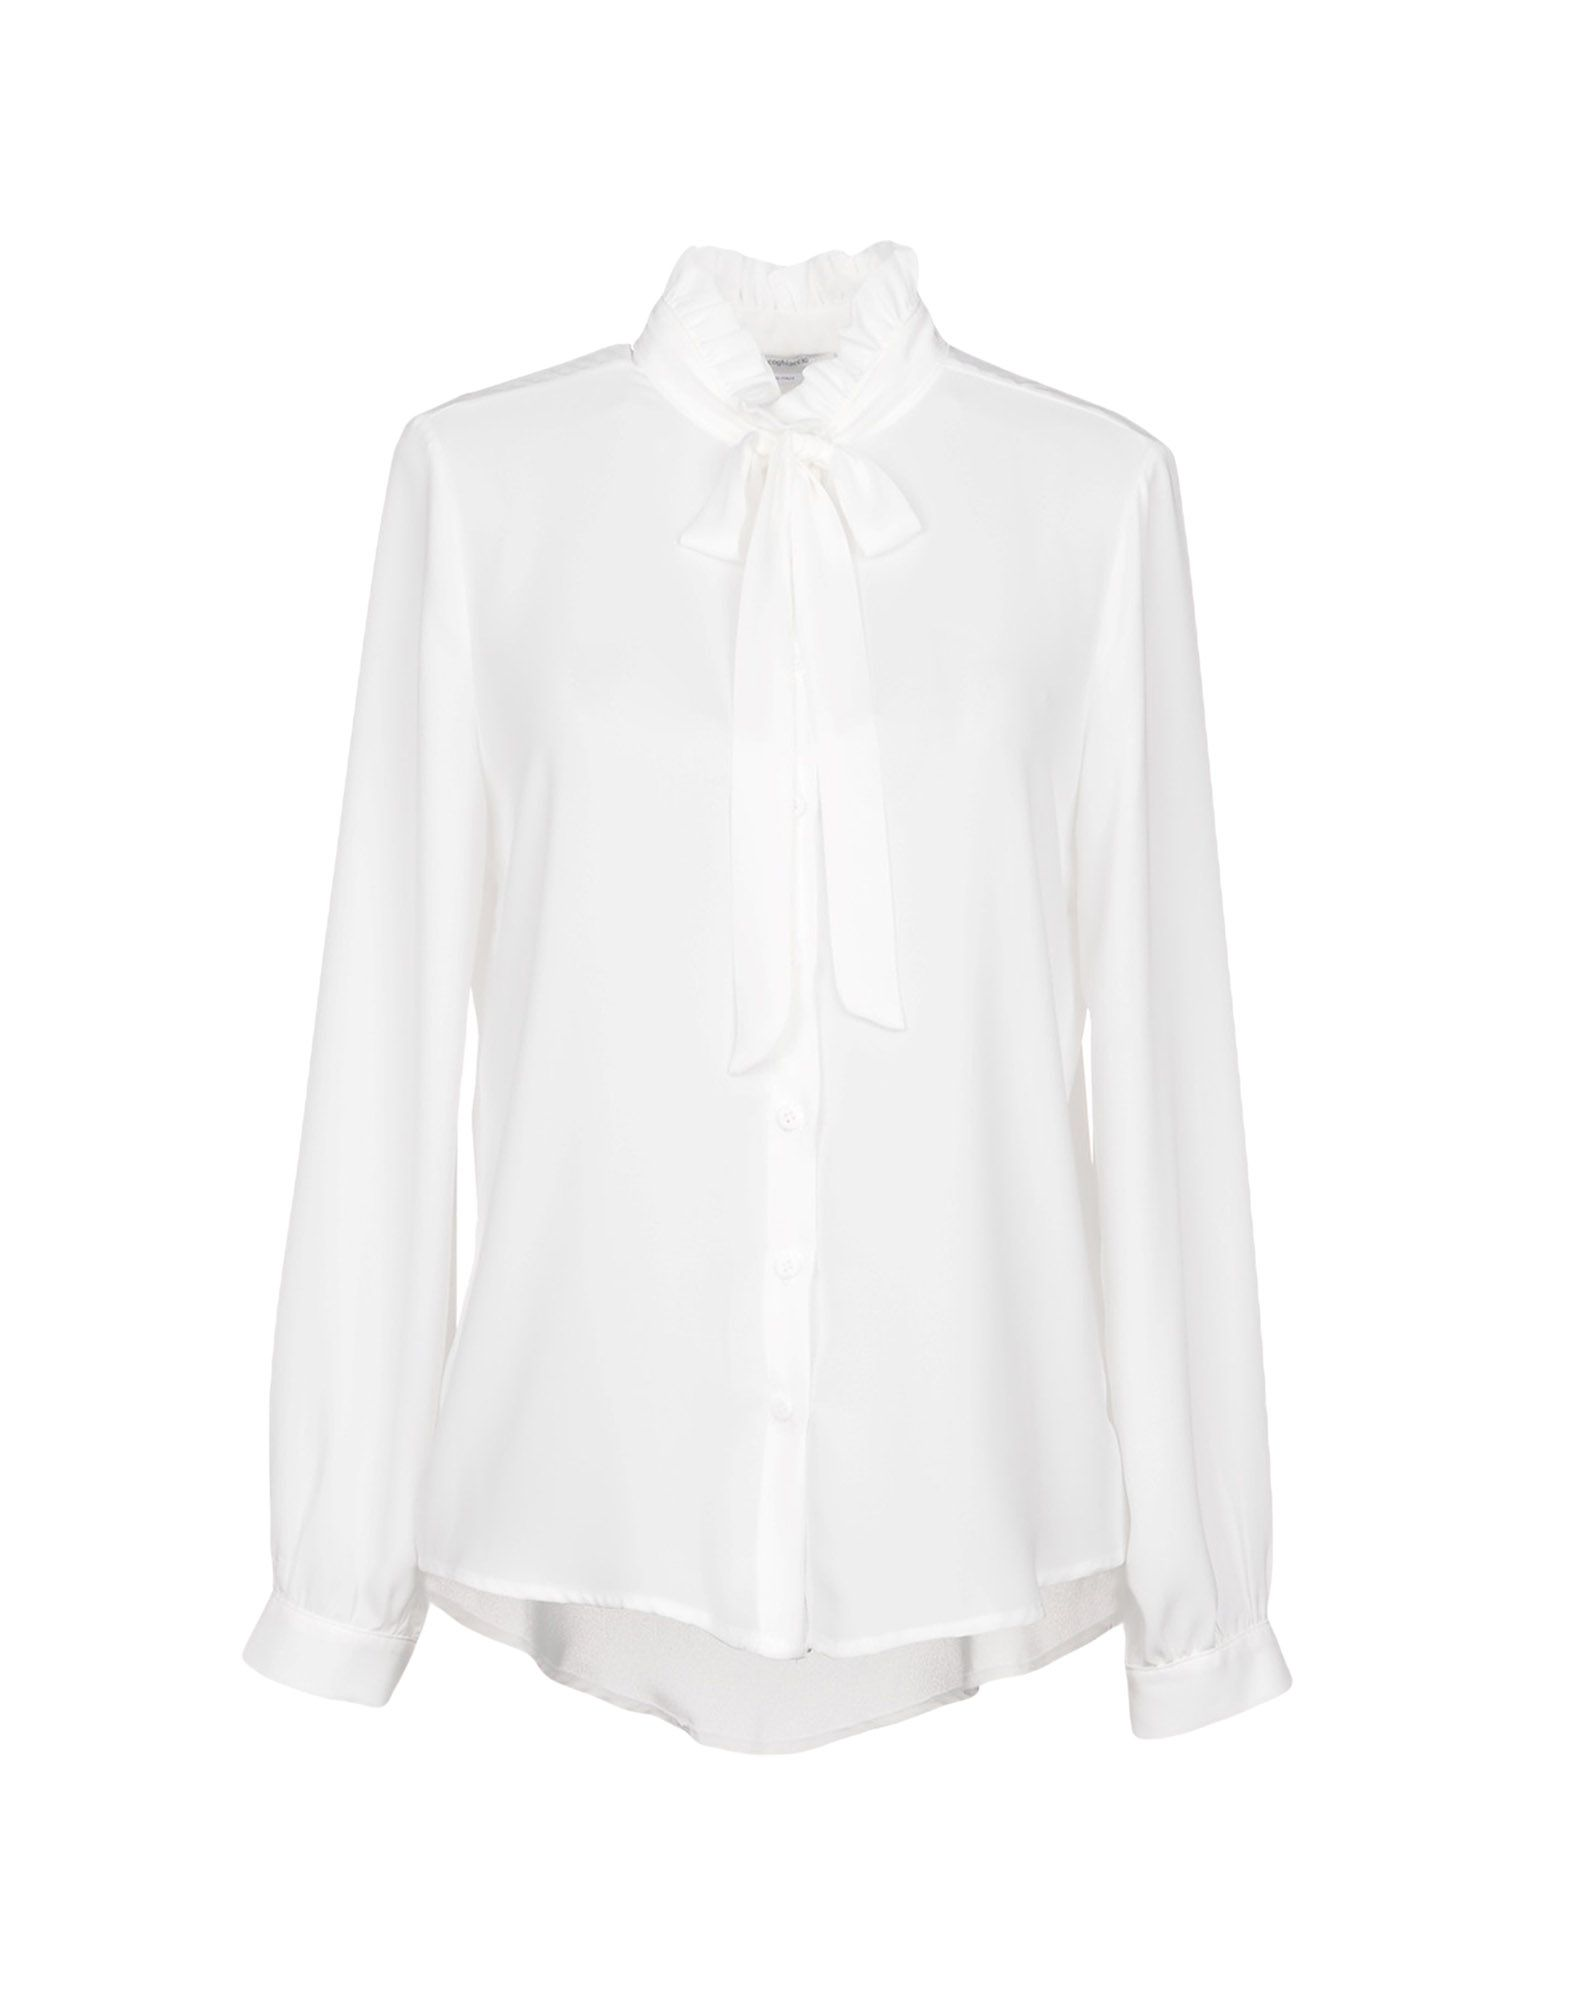 BIANCOGHIACCIO Pубашка biancoghiaccio pубашка